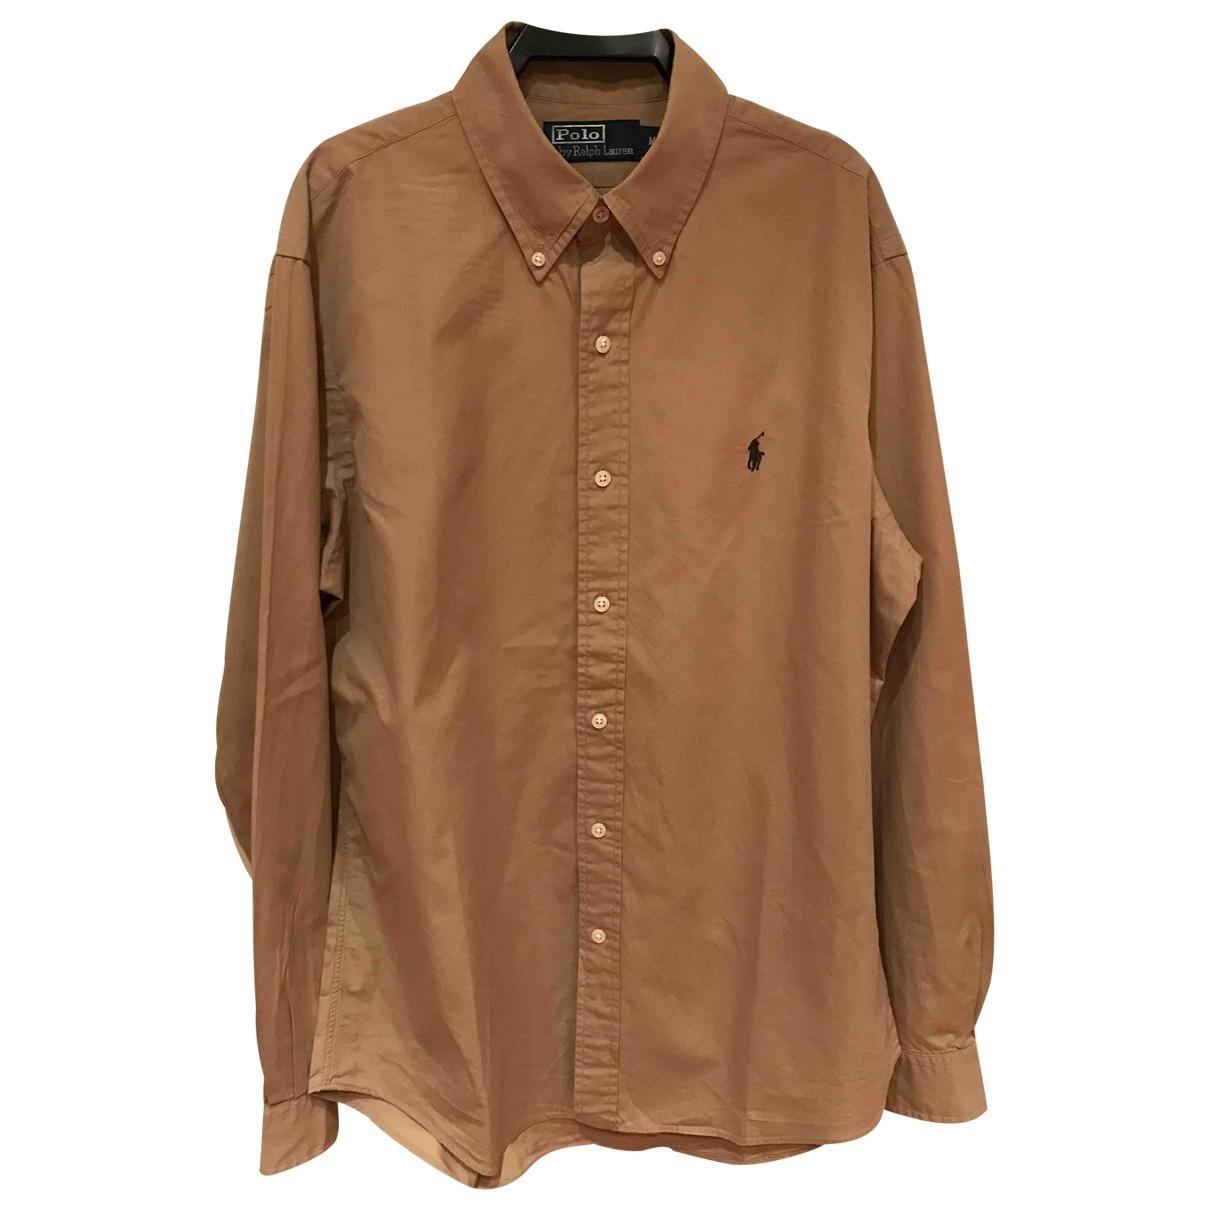 Polo Ralph Lauren \N Khaki Cotton Shirts for Men M International